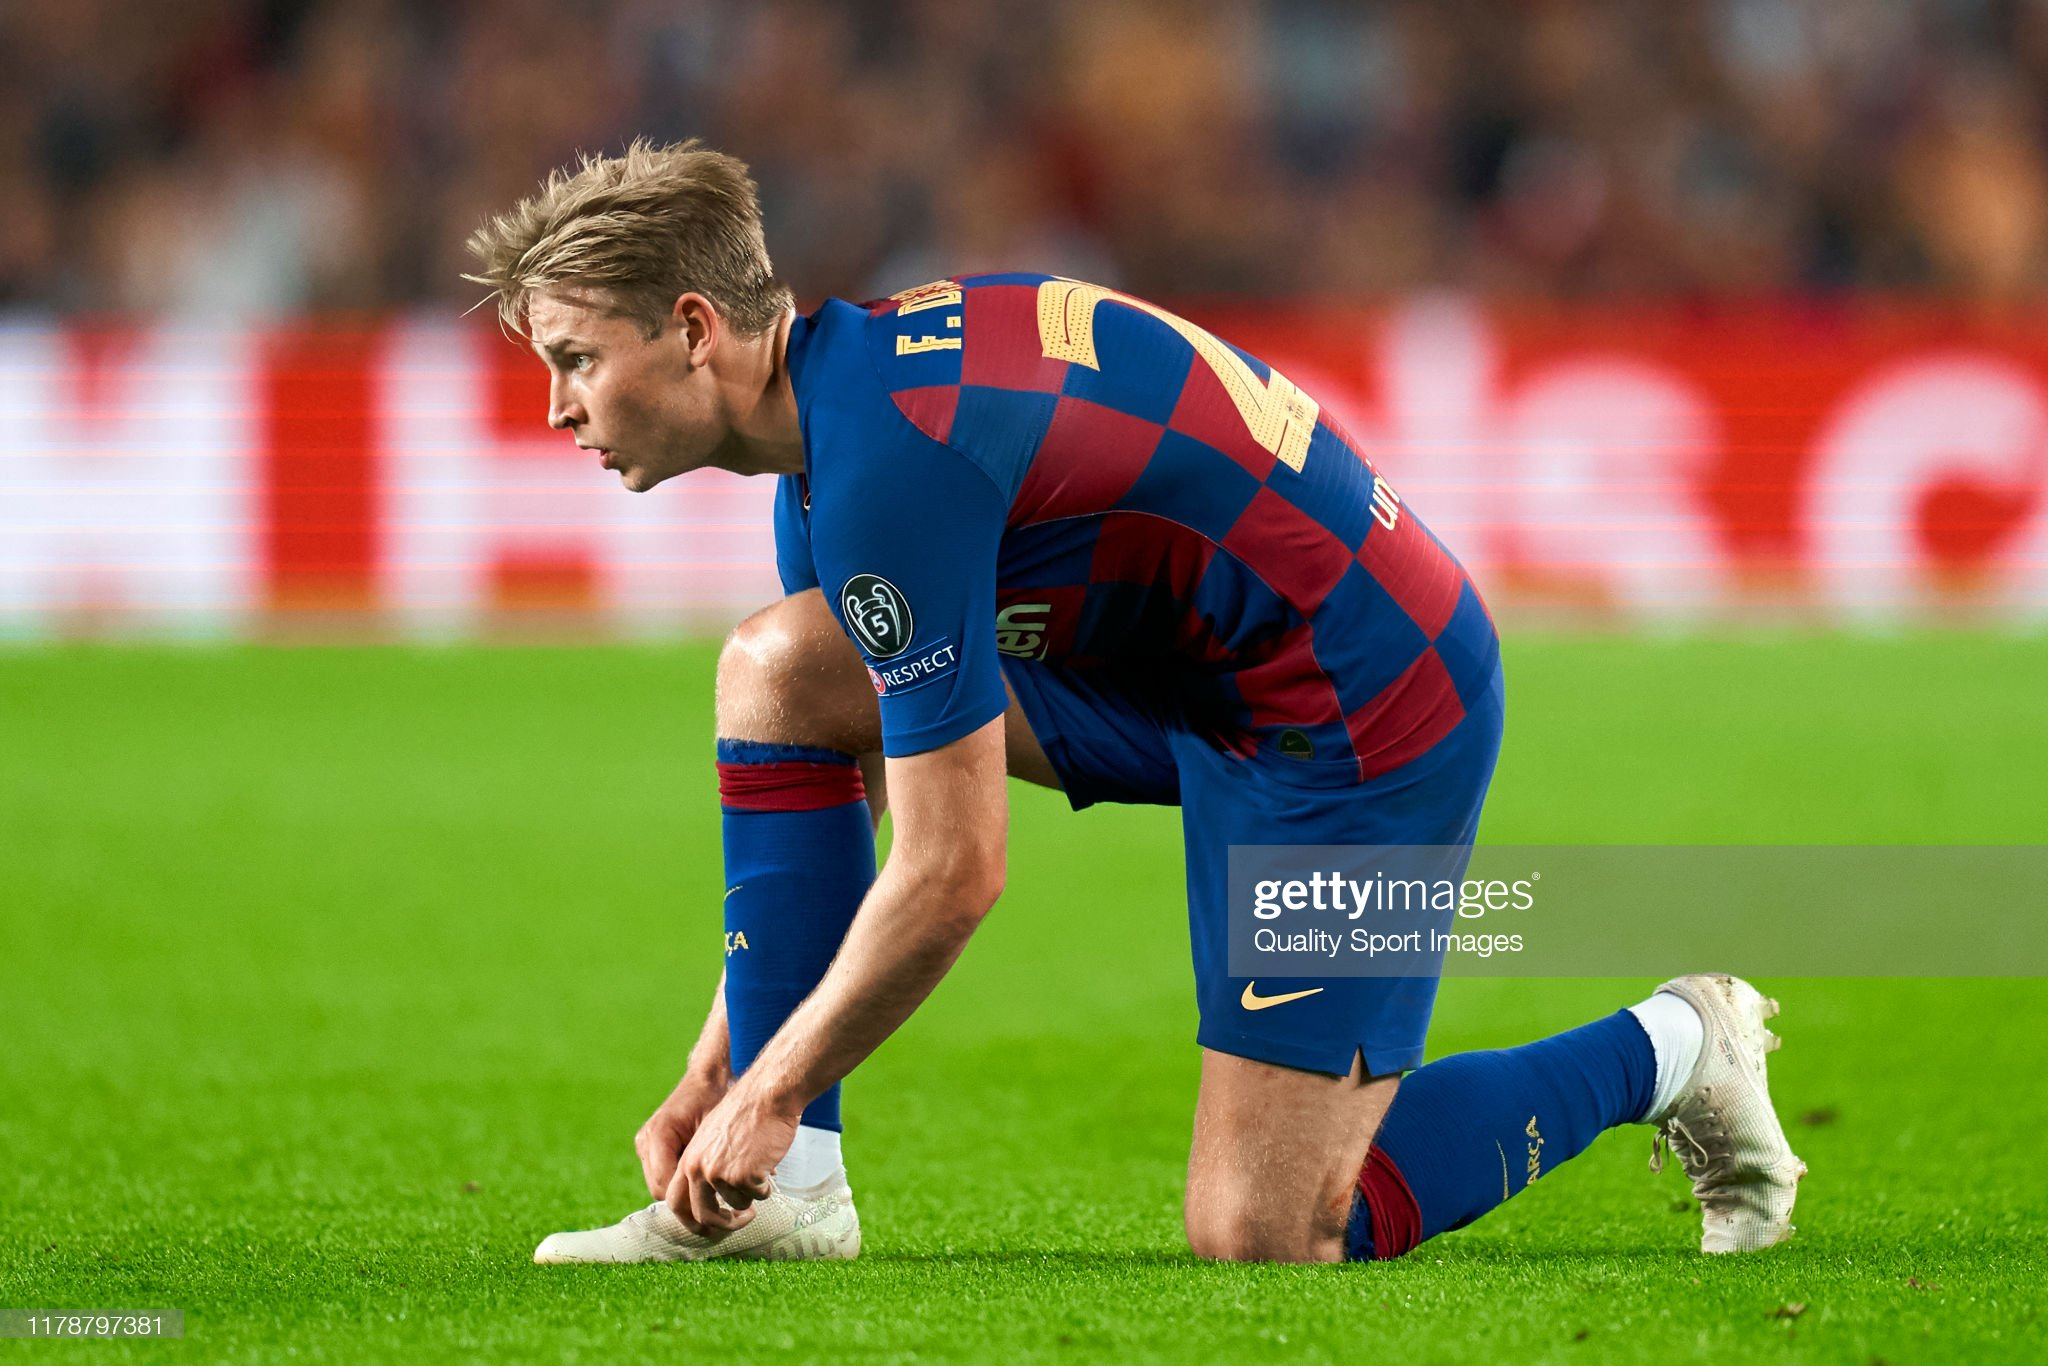 صور مباراة : برشلونة - إنتر 2-1 ( 02-10-2019 )  Frenkie-de-jong-of-fc-barcelona-during-the-uefa-champions-league-f-picture-id1178797381?s=2048x2048